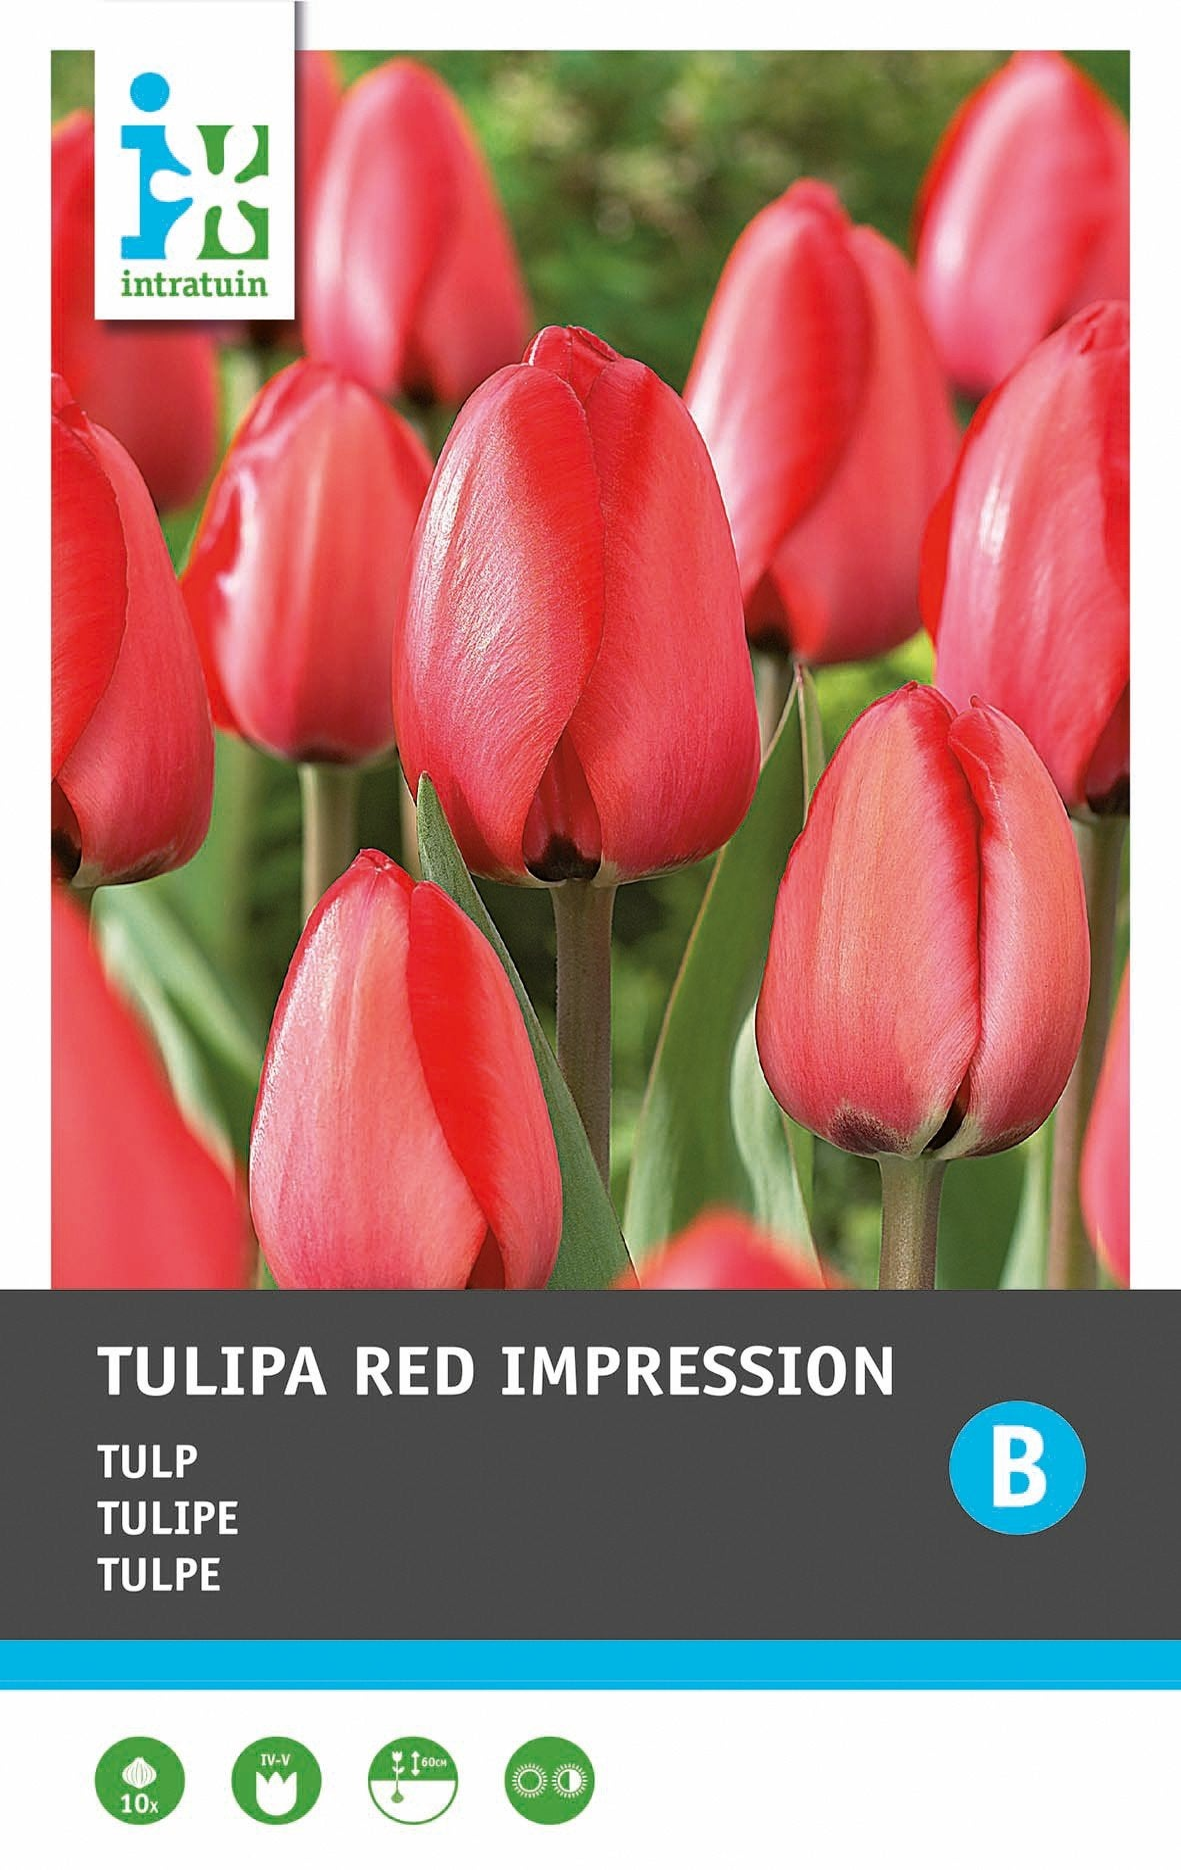 Intratuin bloembollen Tulp (Tulipa 'Red Impression') 10 stuks